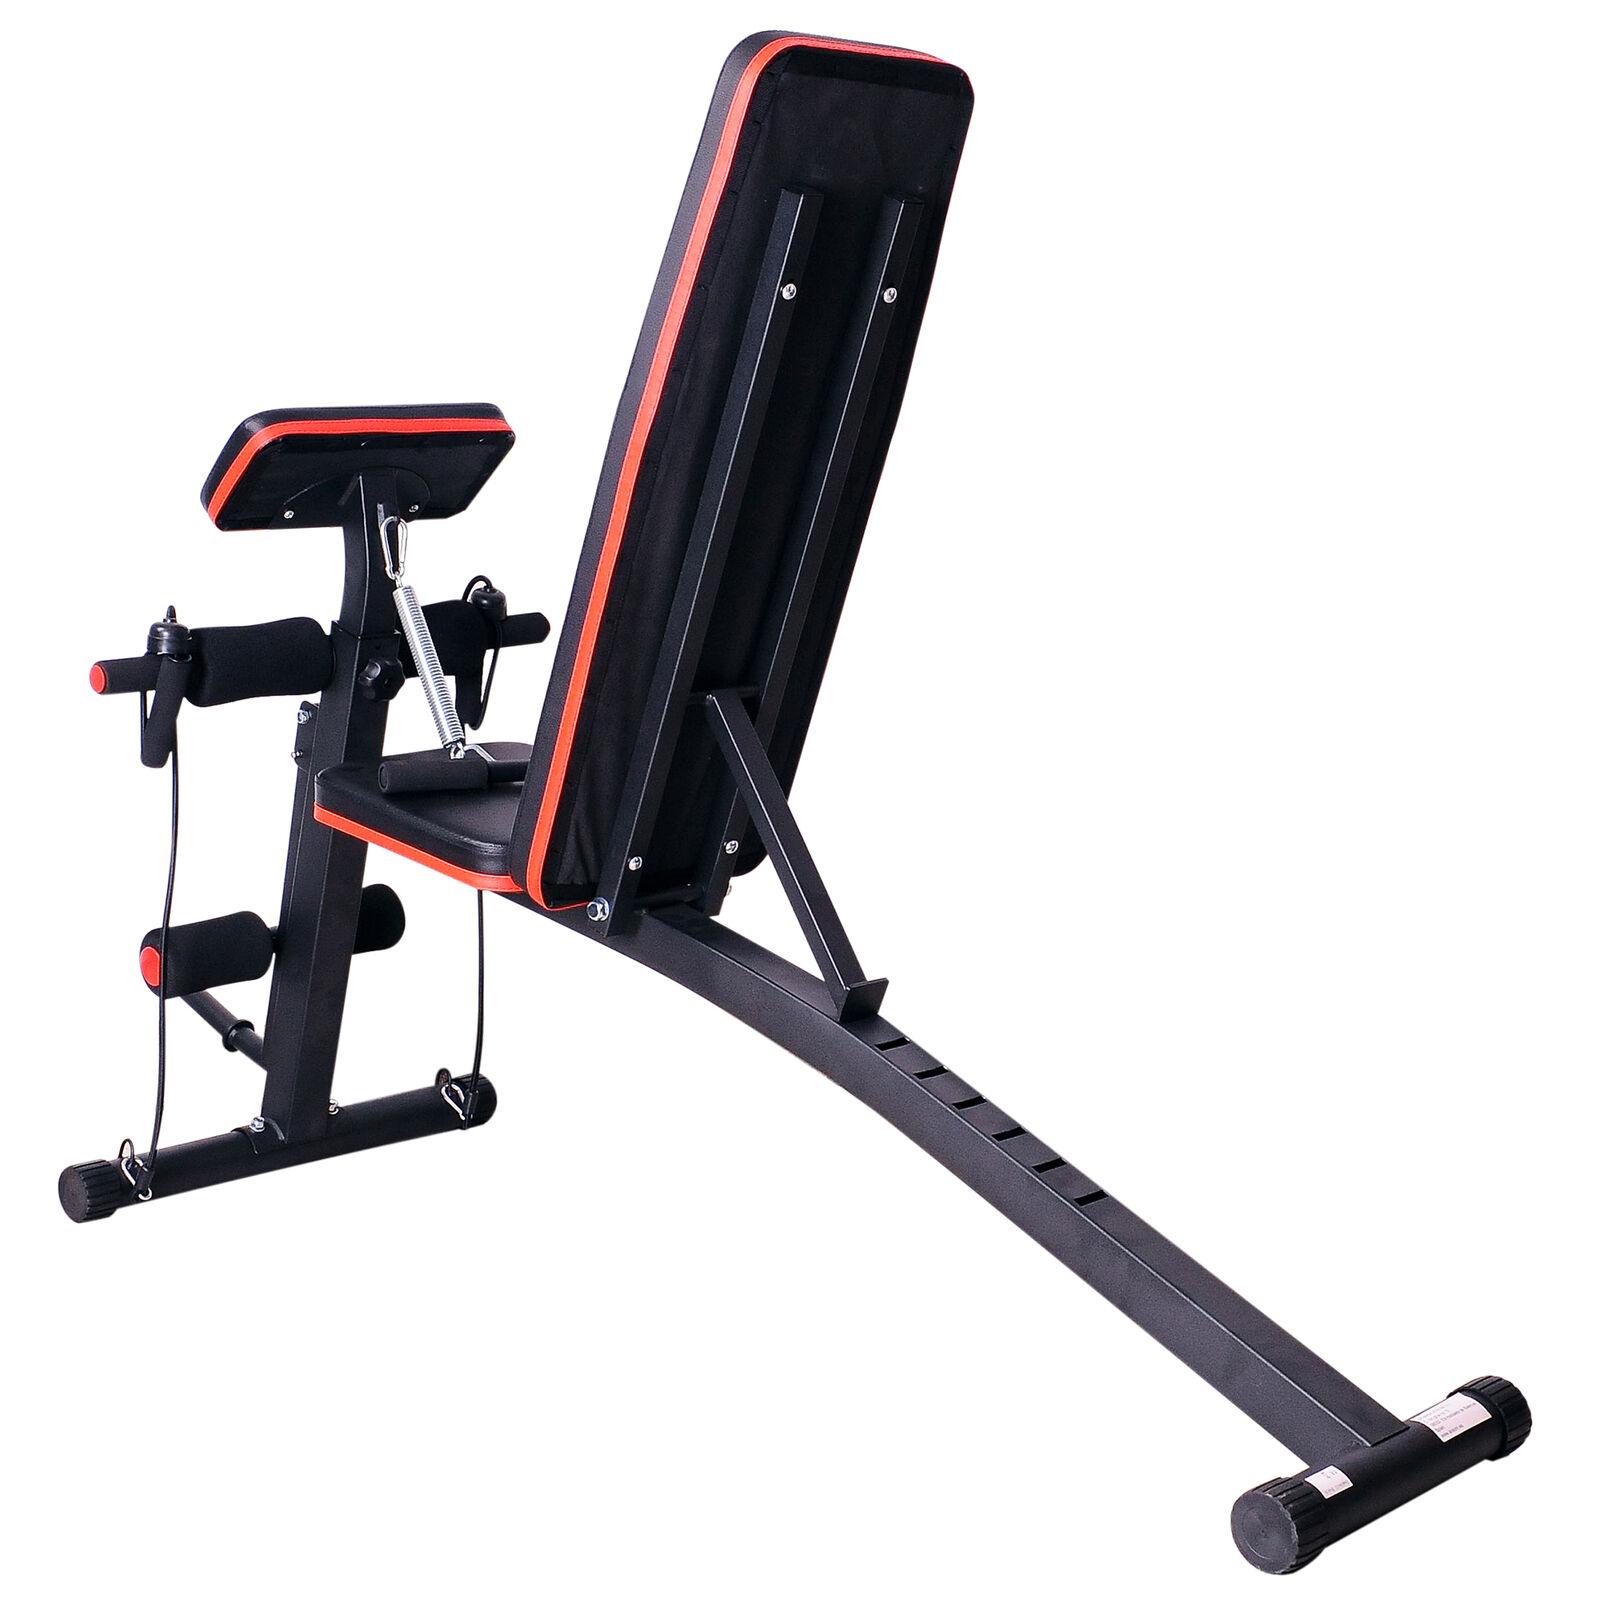 Foldable Dumbbell Bench Weight Training Fitness 6 Incline Adjustable Workout Gym - £53.99 delivered (UK Mainland only) @ ebay / 2011homcom